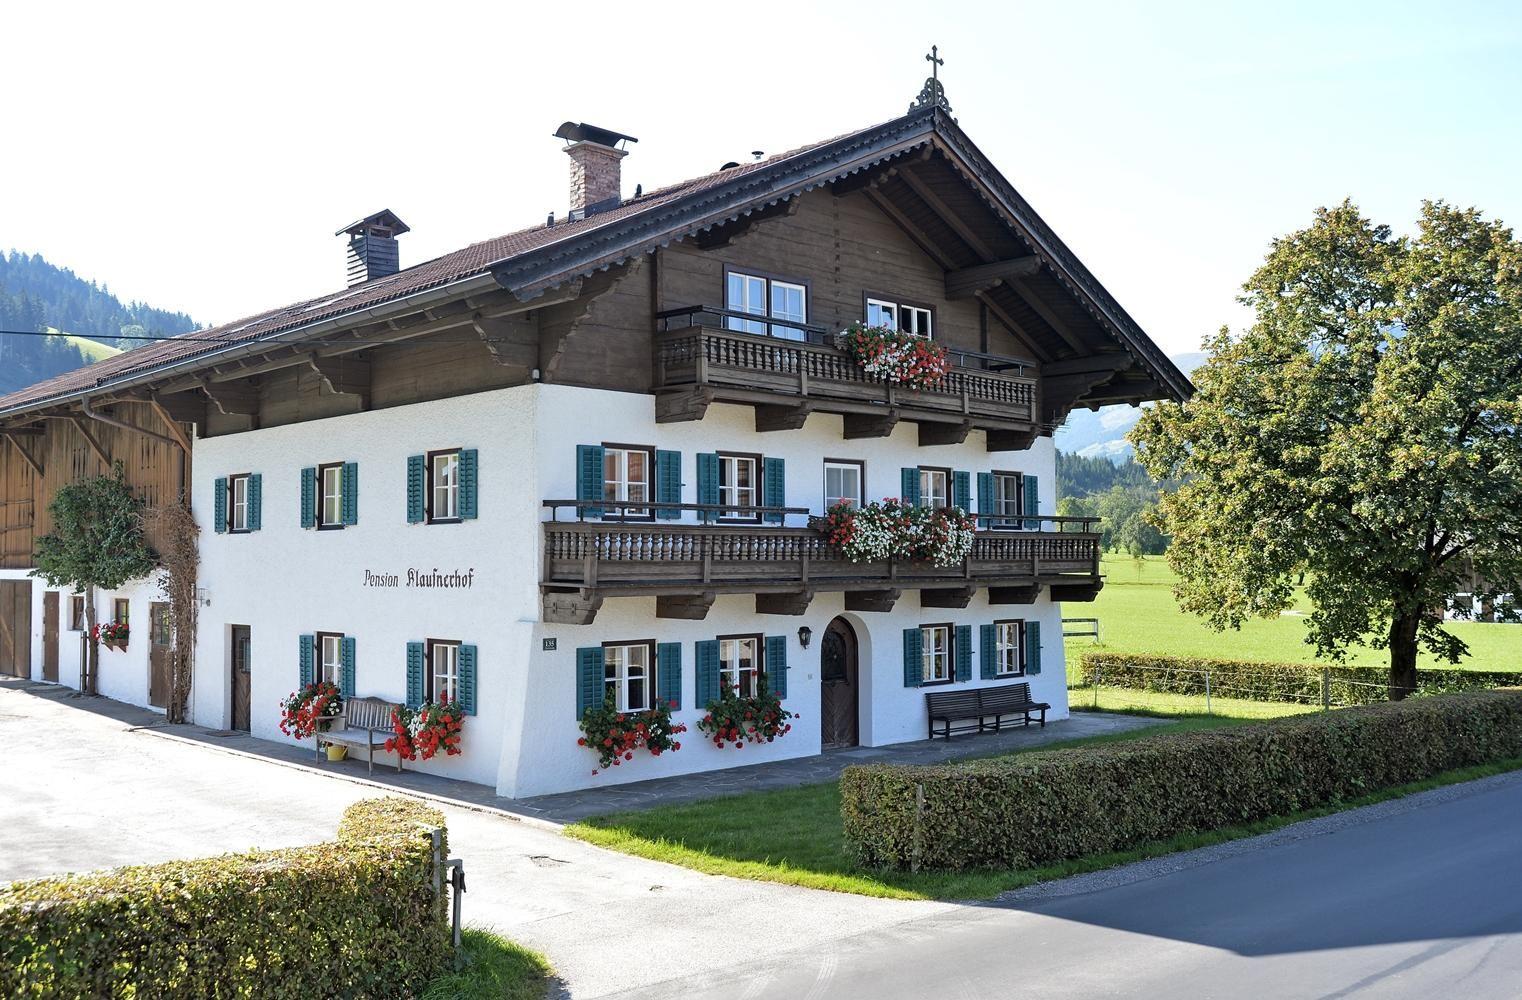 Fam. Schmid Grasslhof - Westendorf - in den Kitzbheler Alpen